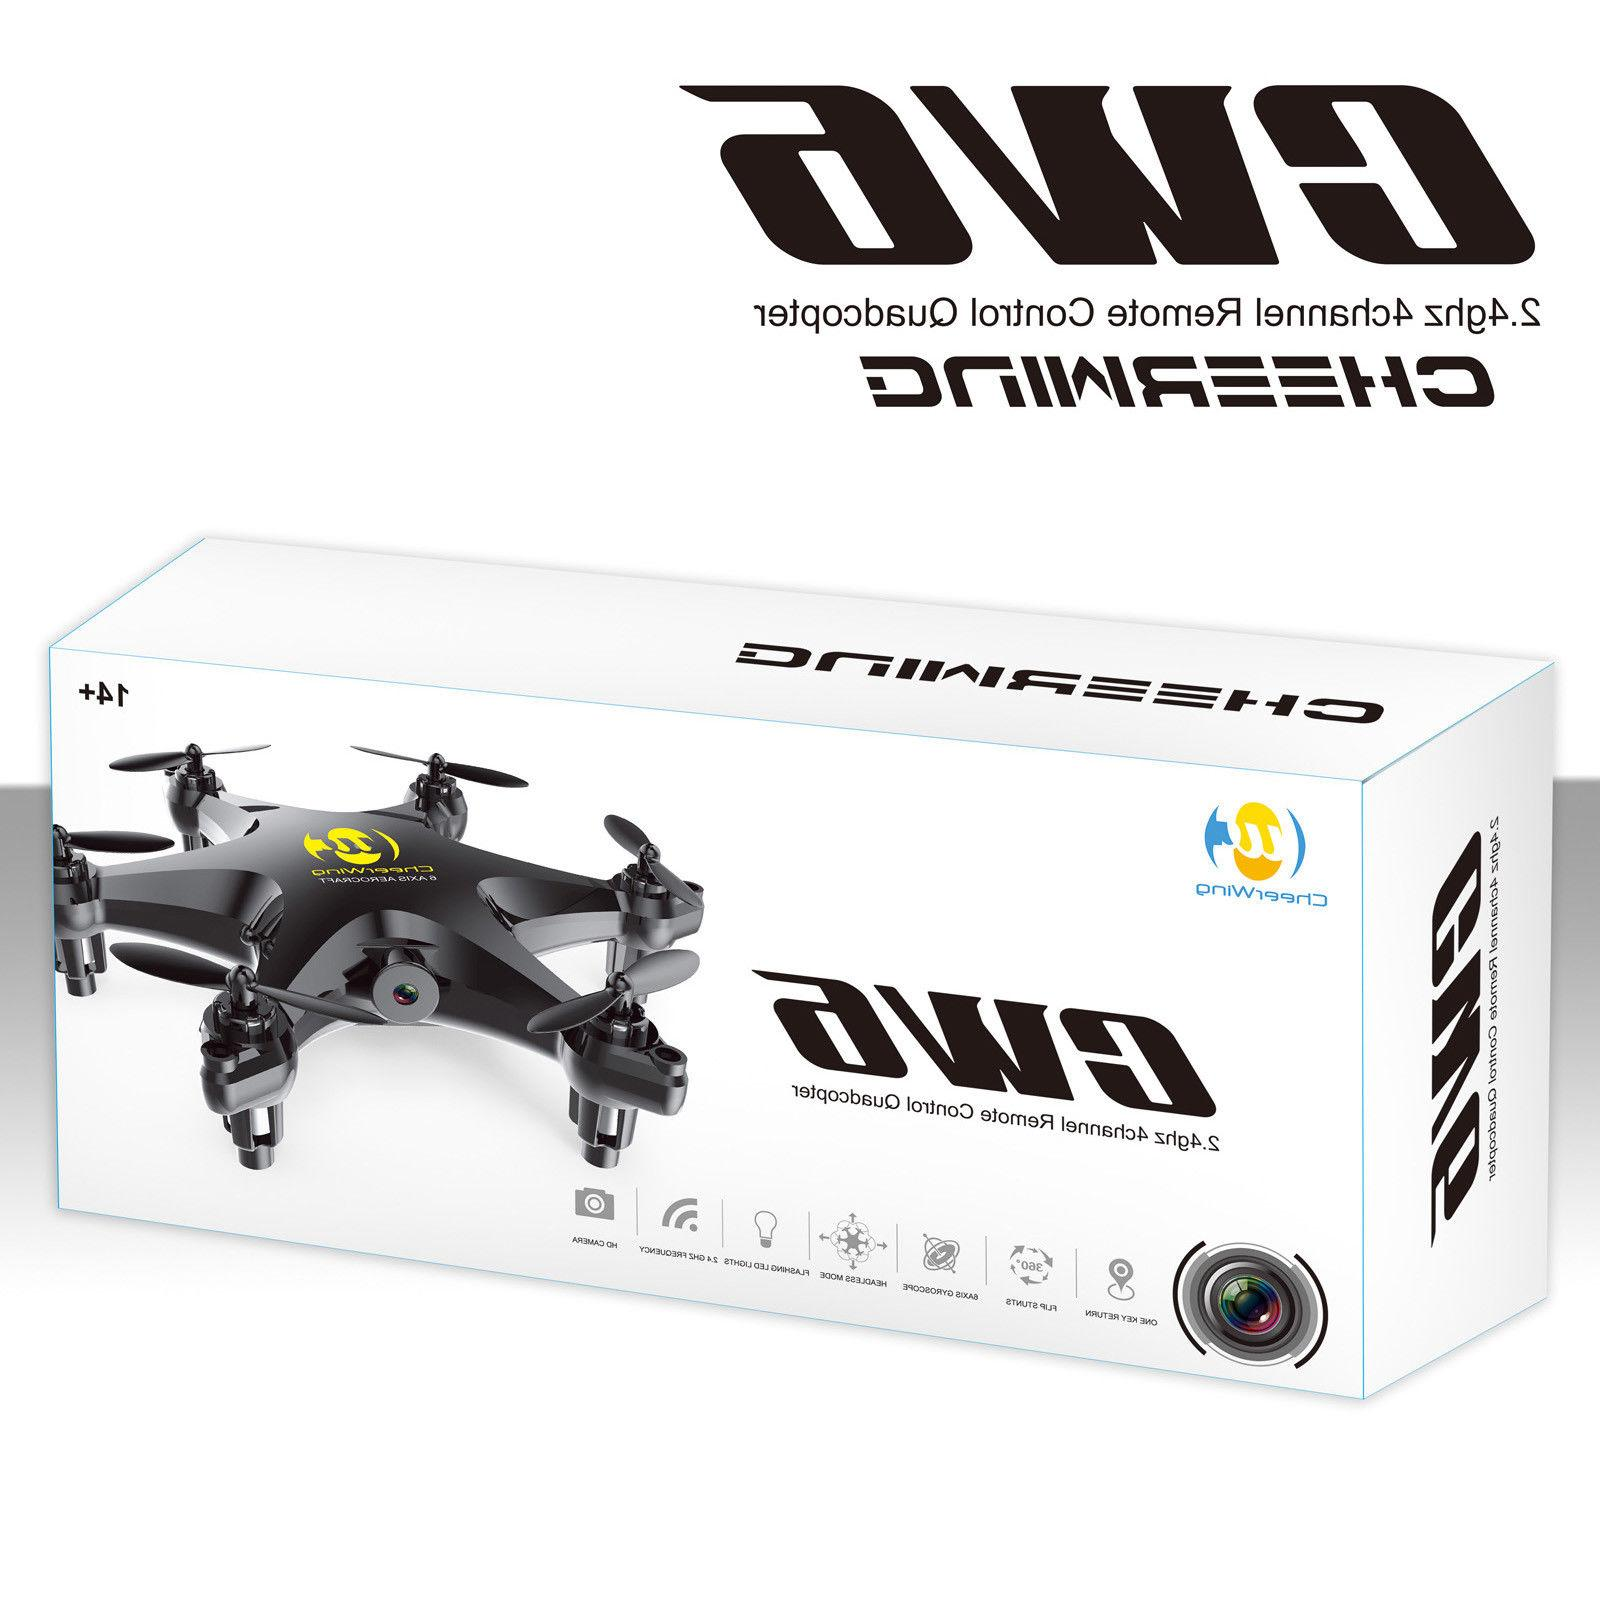 Cheerwing CW6 RC Drone w/2MP Camera